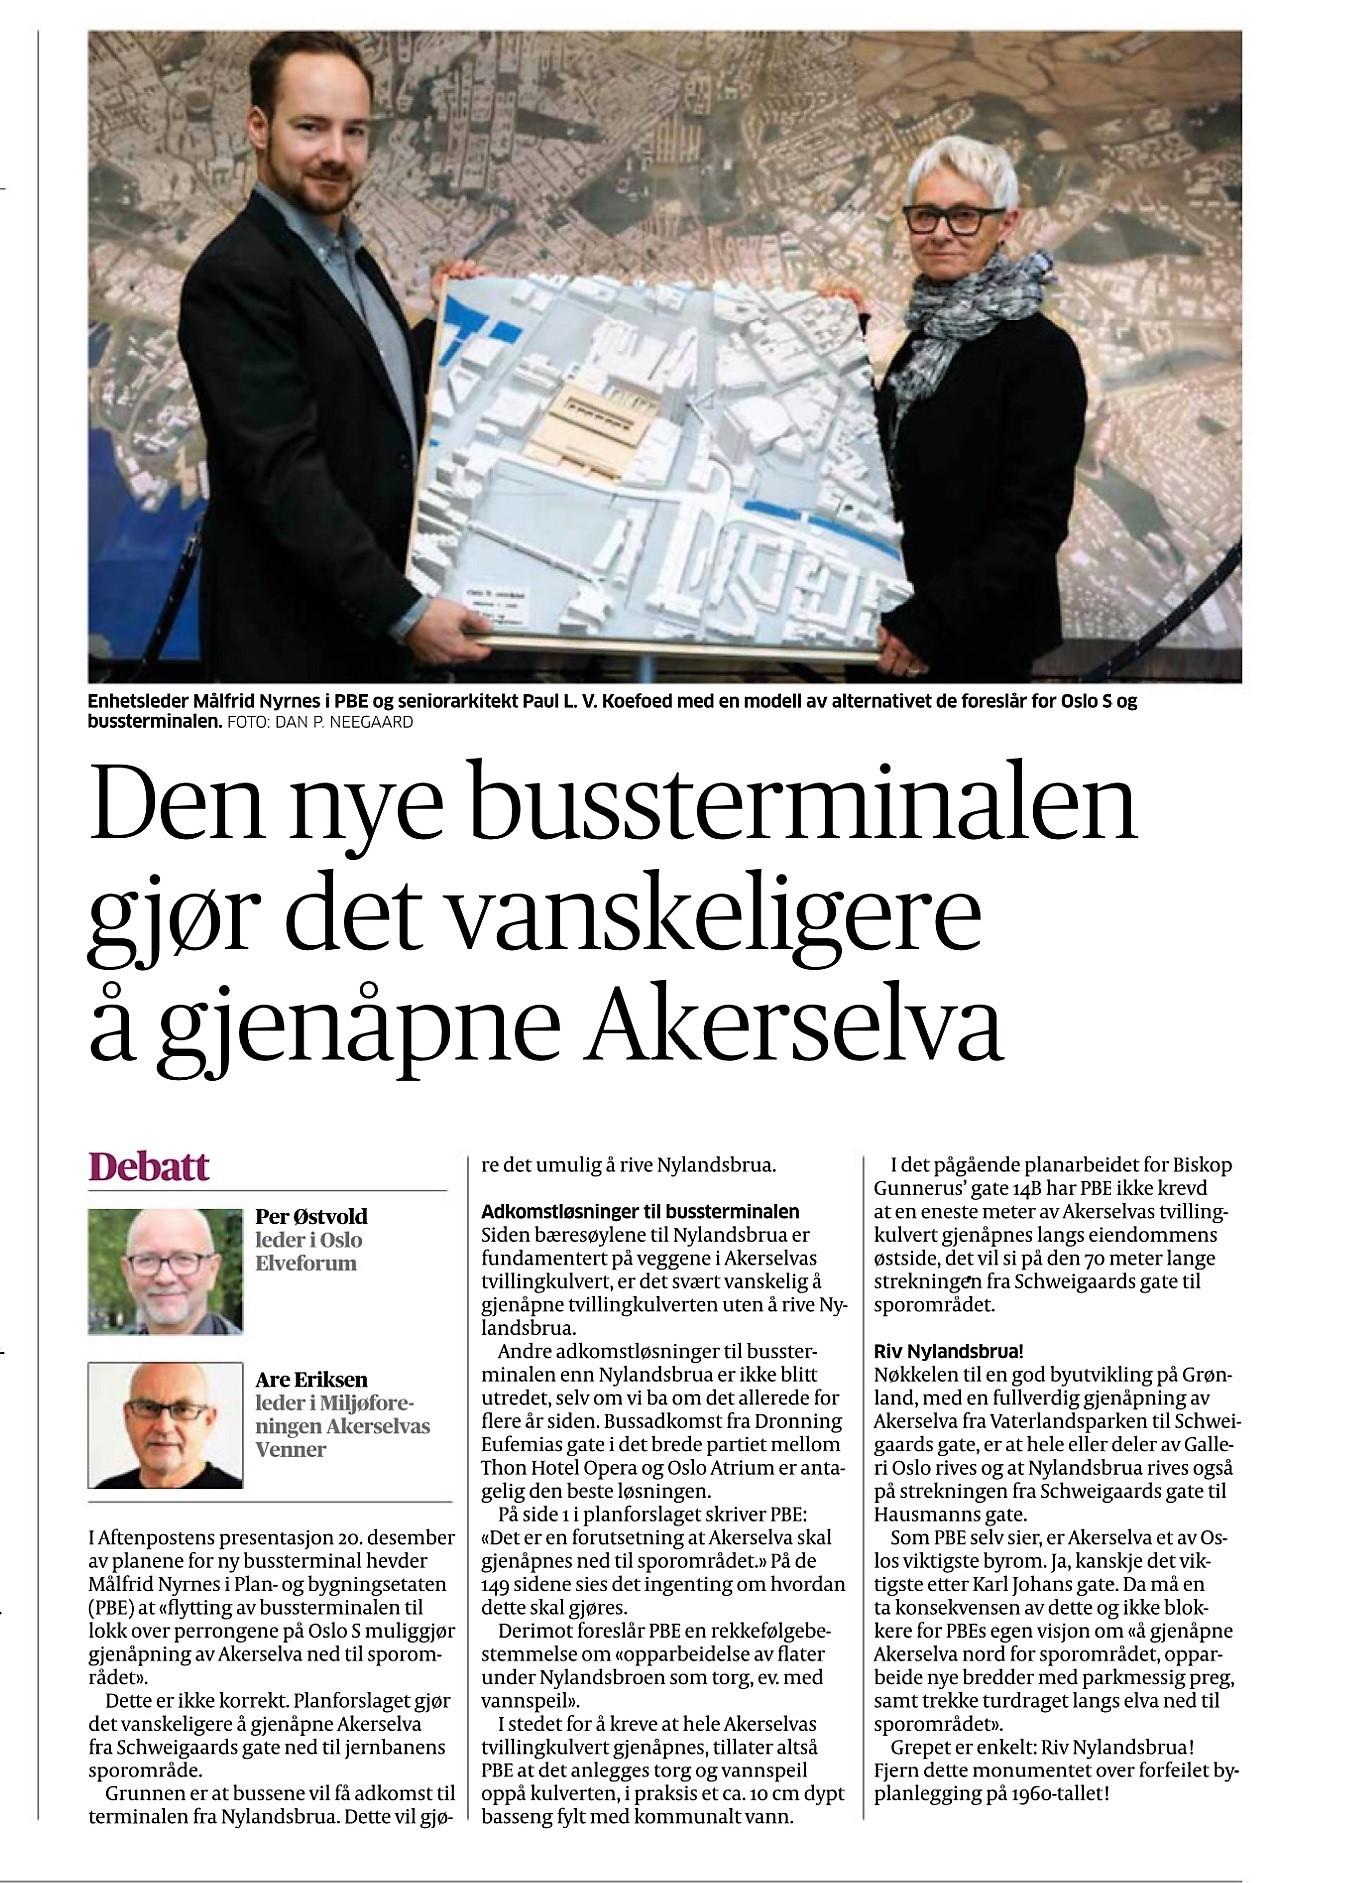 Artikkel i Aftenposten 5.1.2018